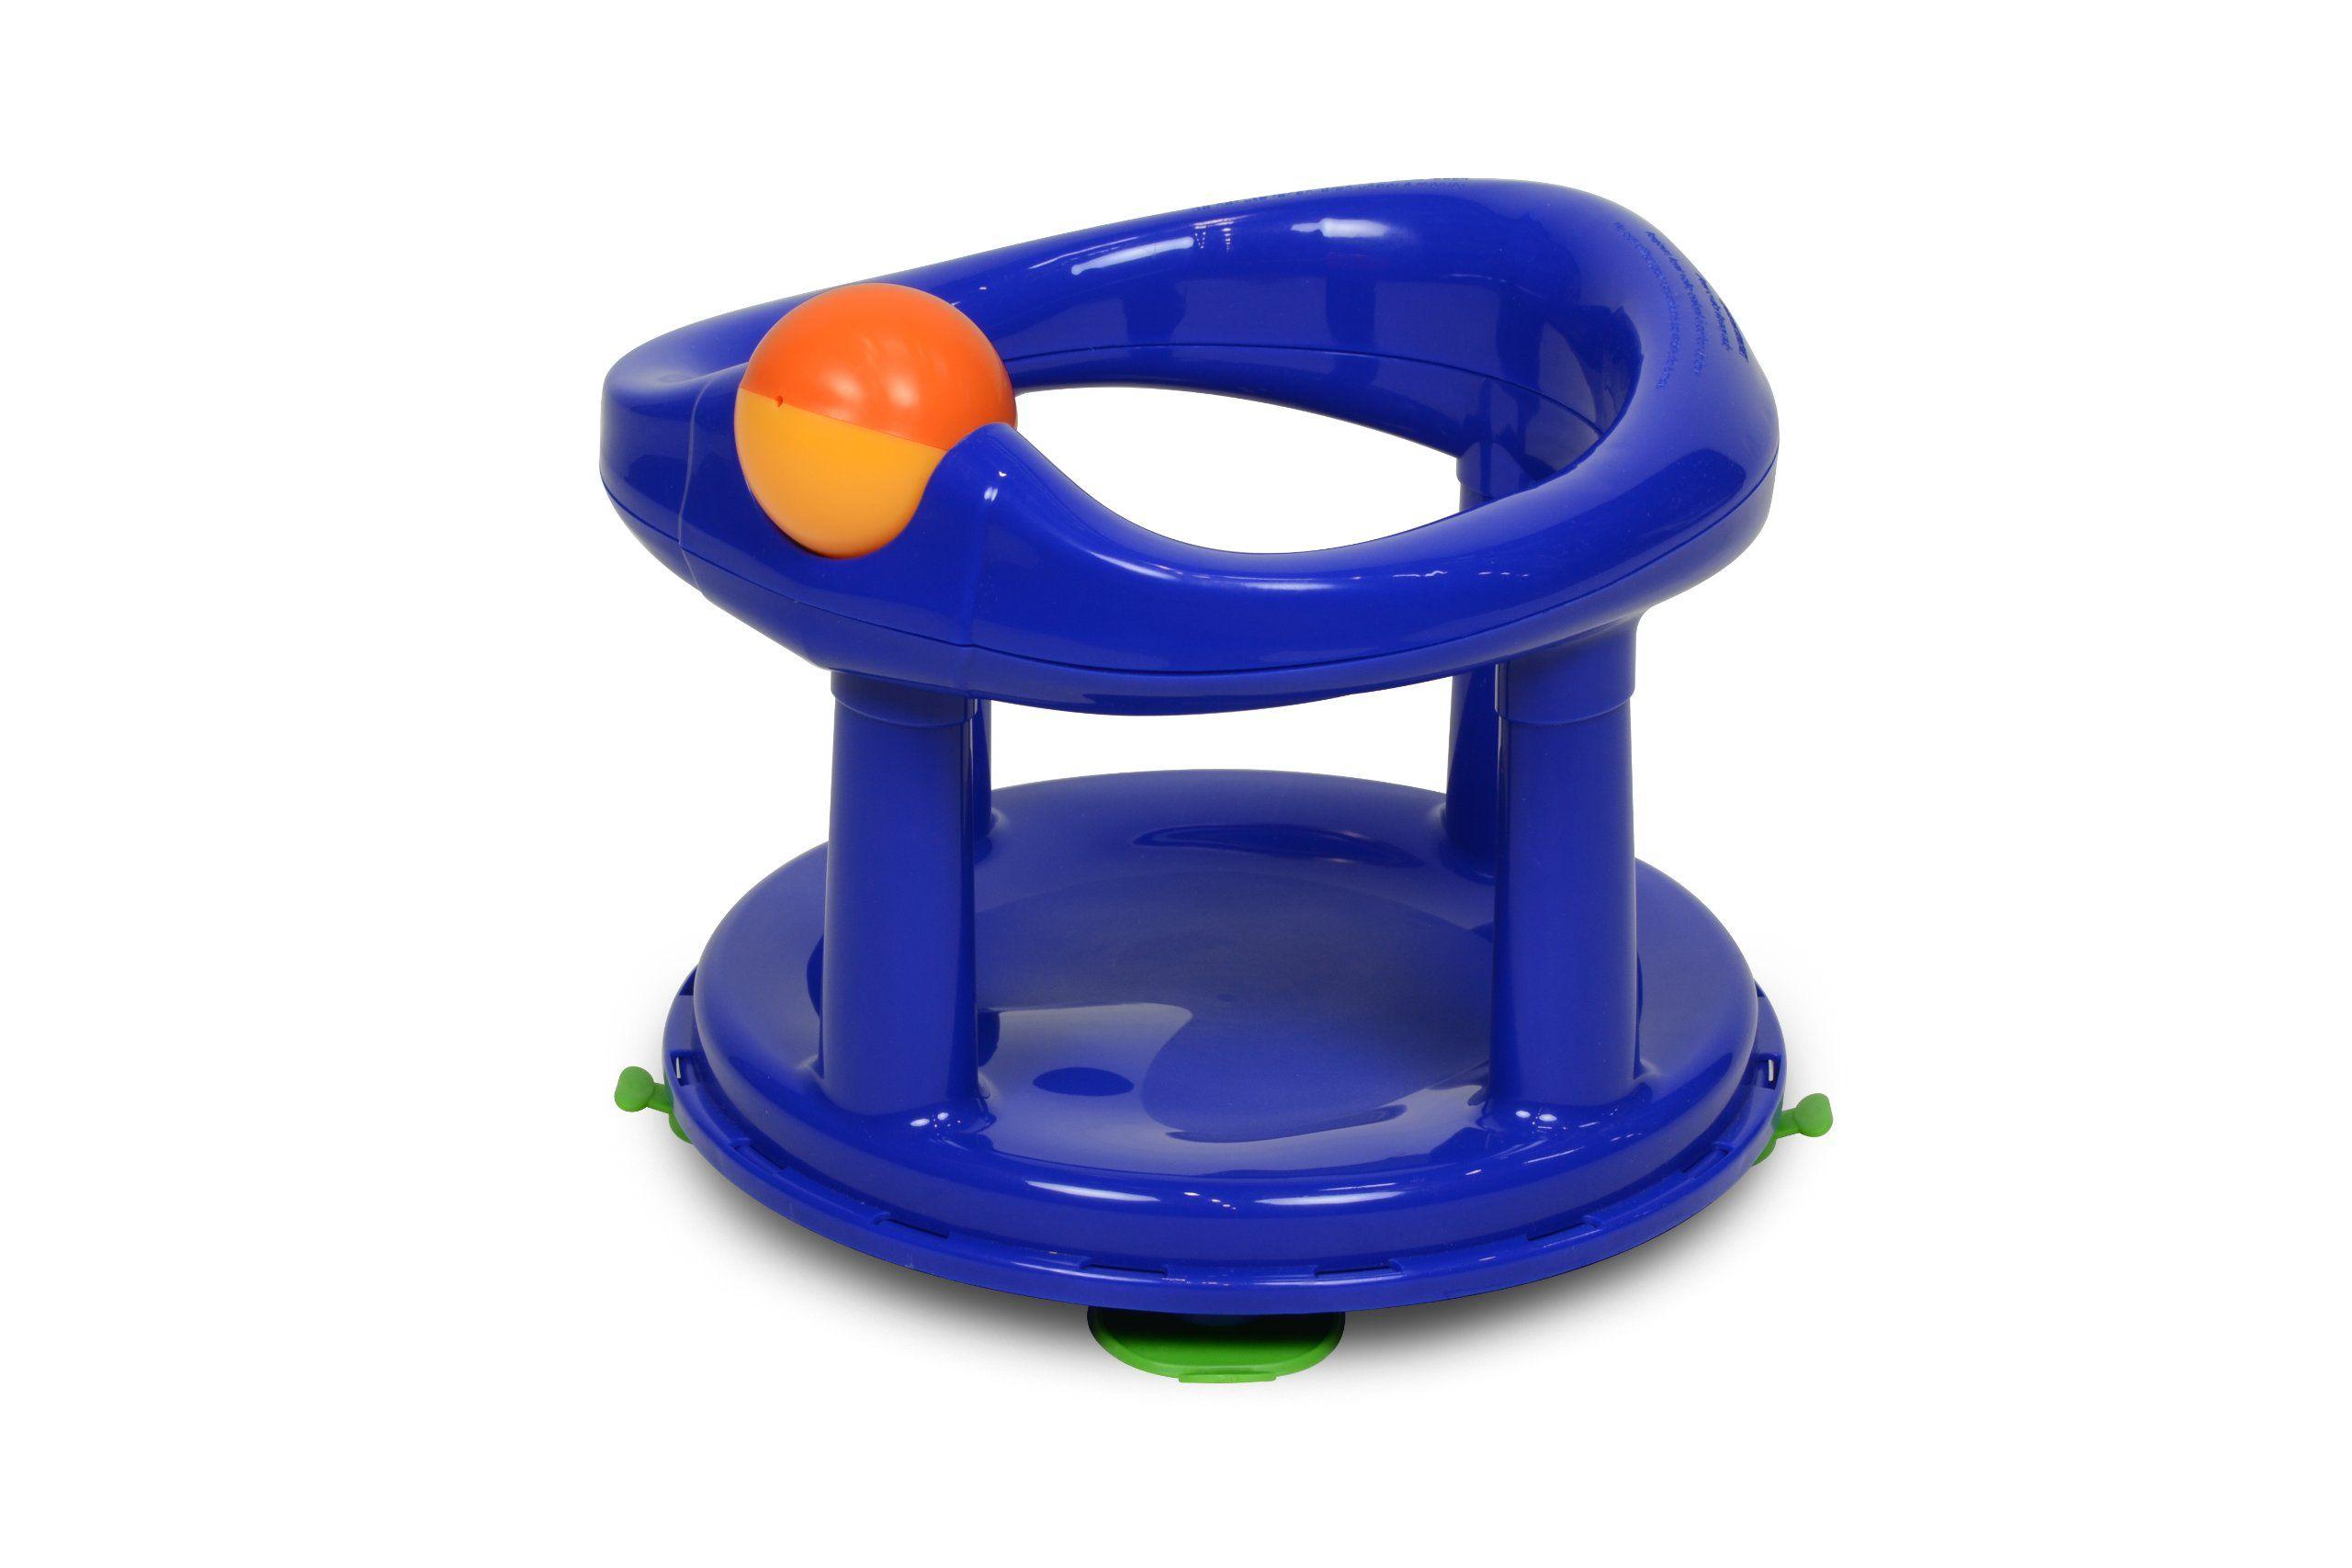 Safety 1st Swivel Bath Seat (Primary): Safety 1st: Amazon.co.uk ...